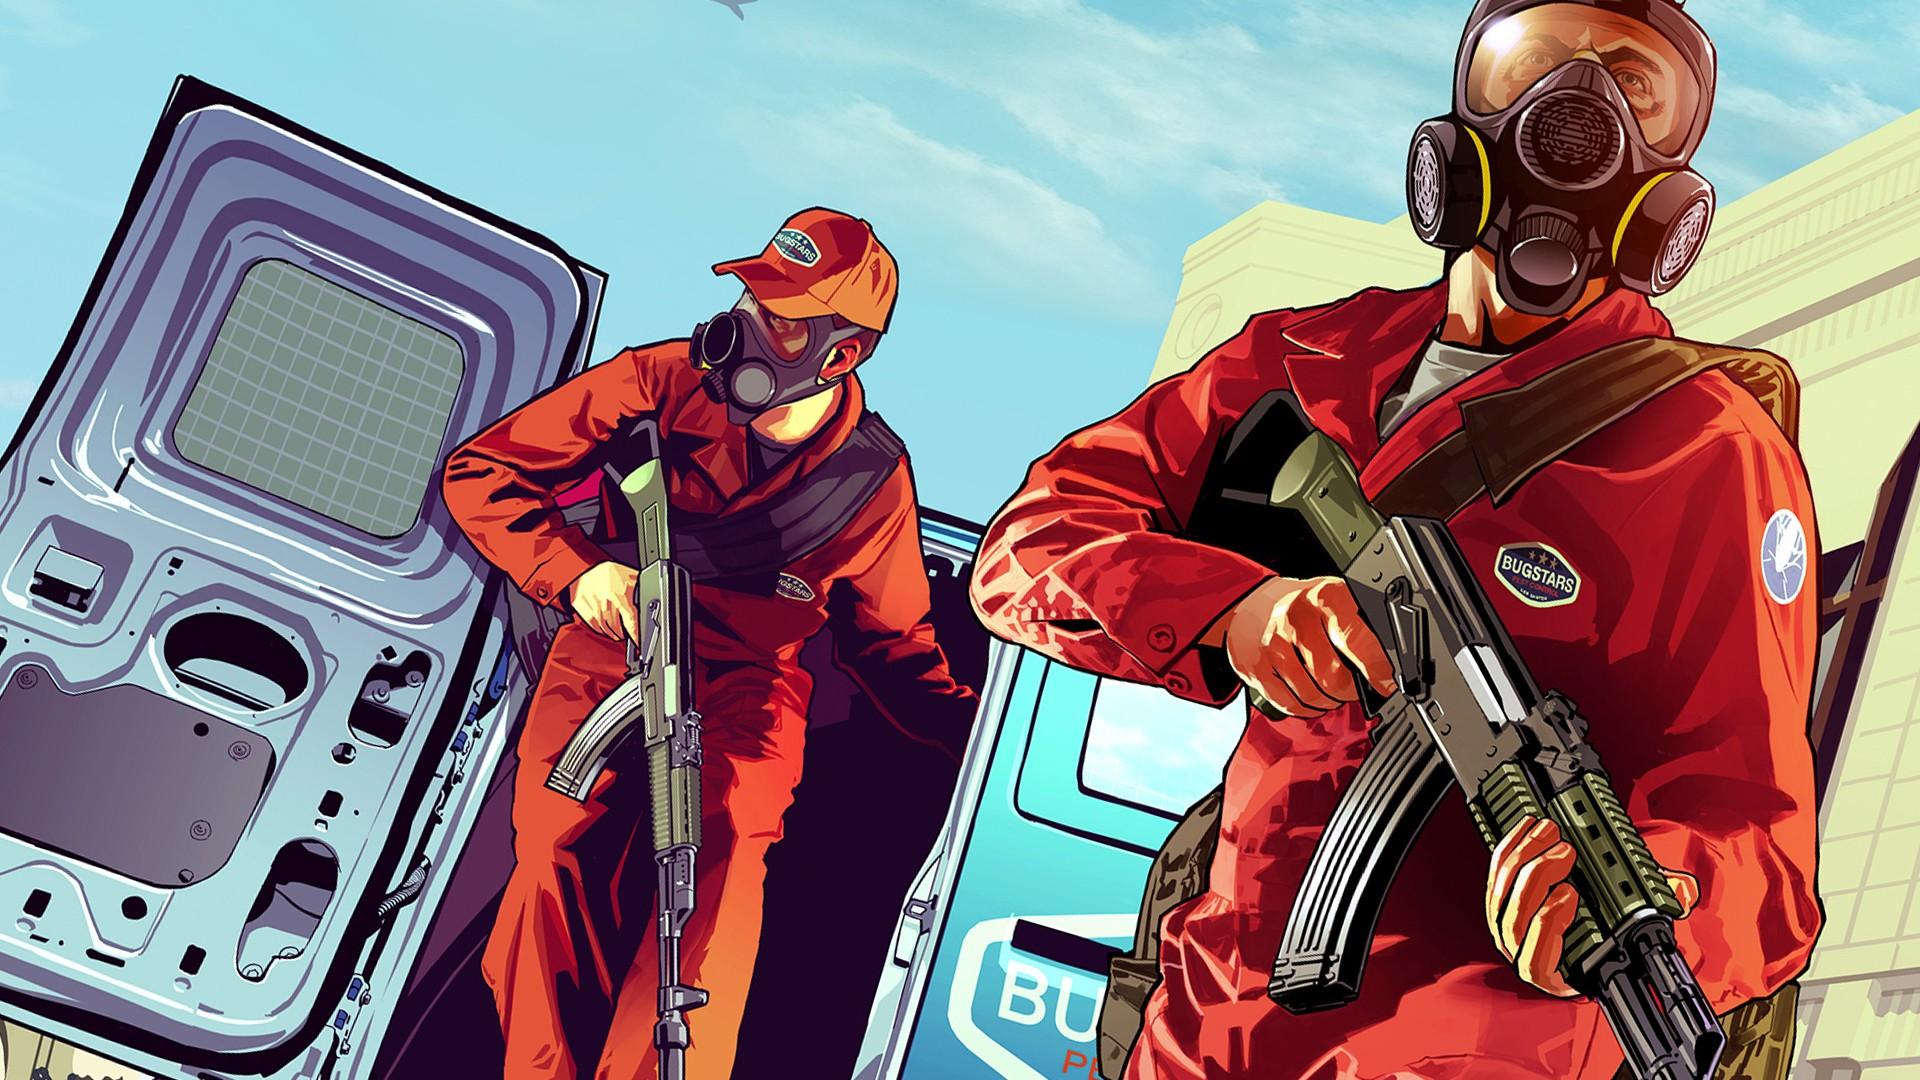 Grand Theft Auto V Fond d'écran HD | Arrière-Plan | 1920x1080 | ID:519167 - Wallpaper Abyss